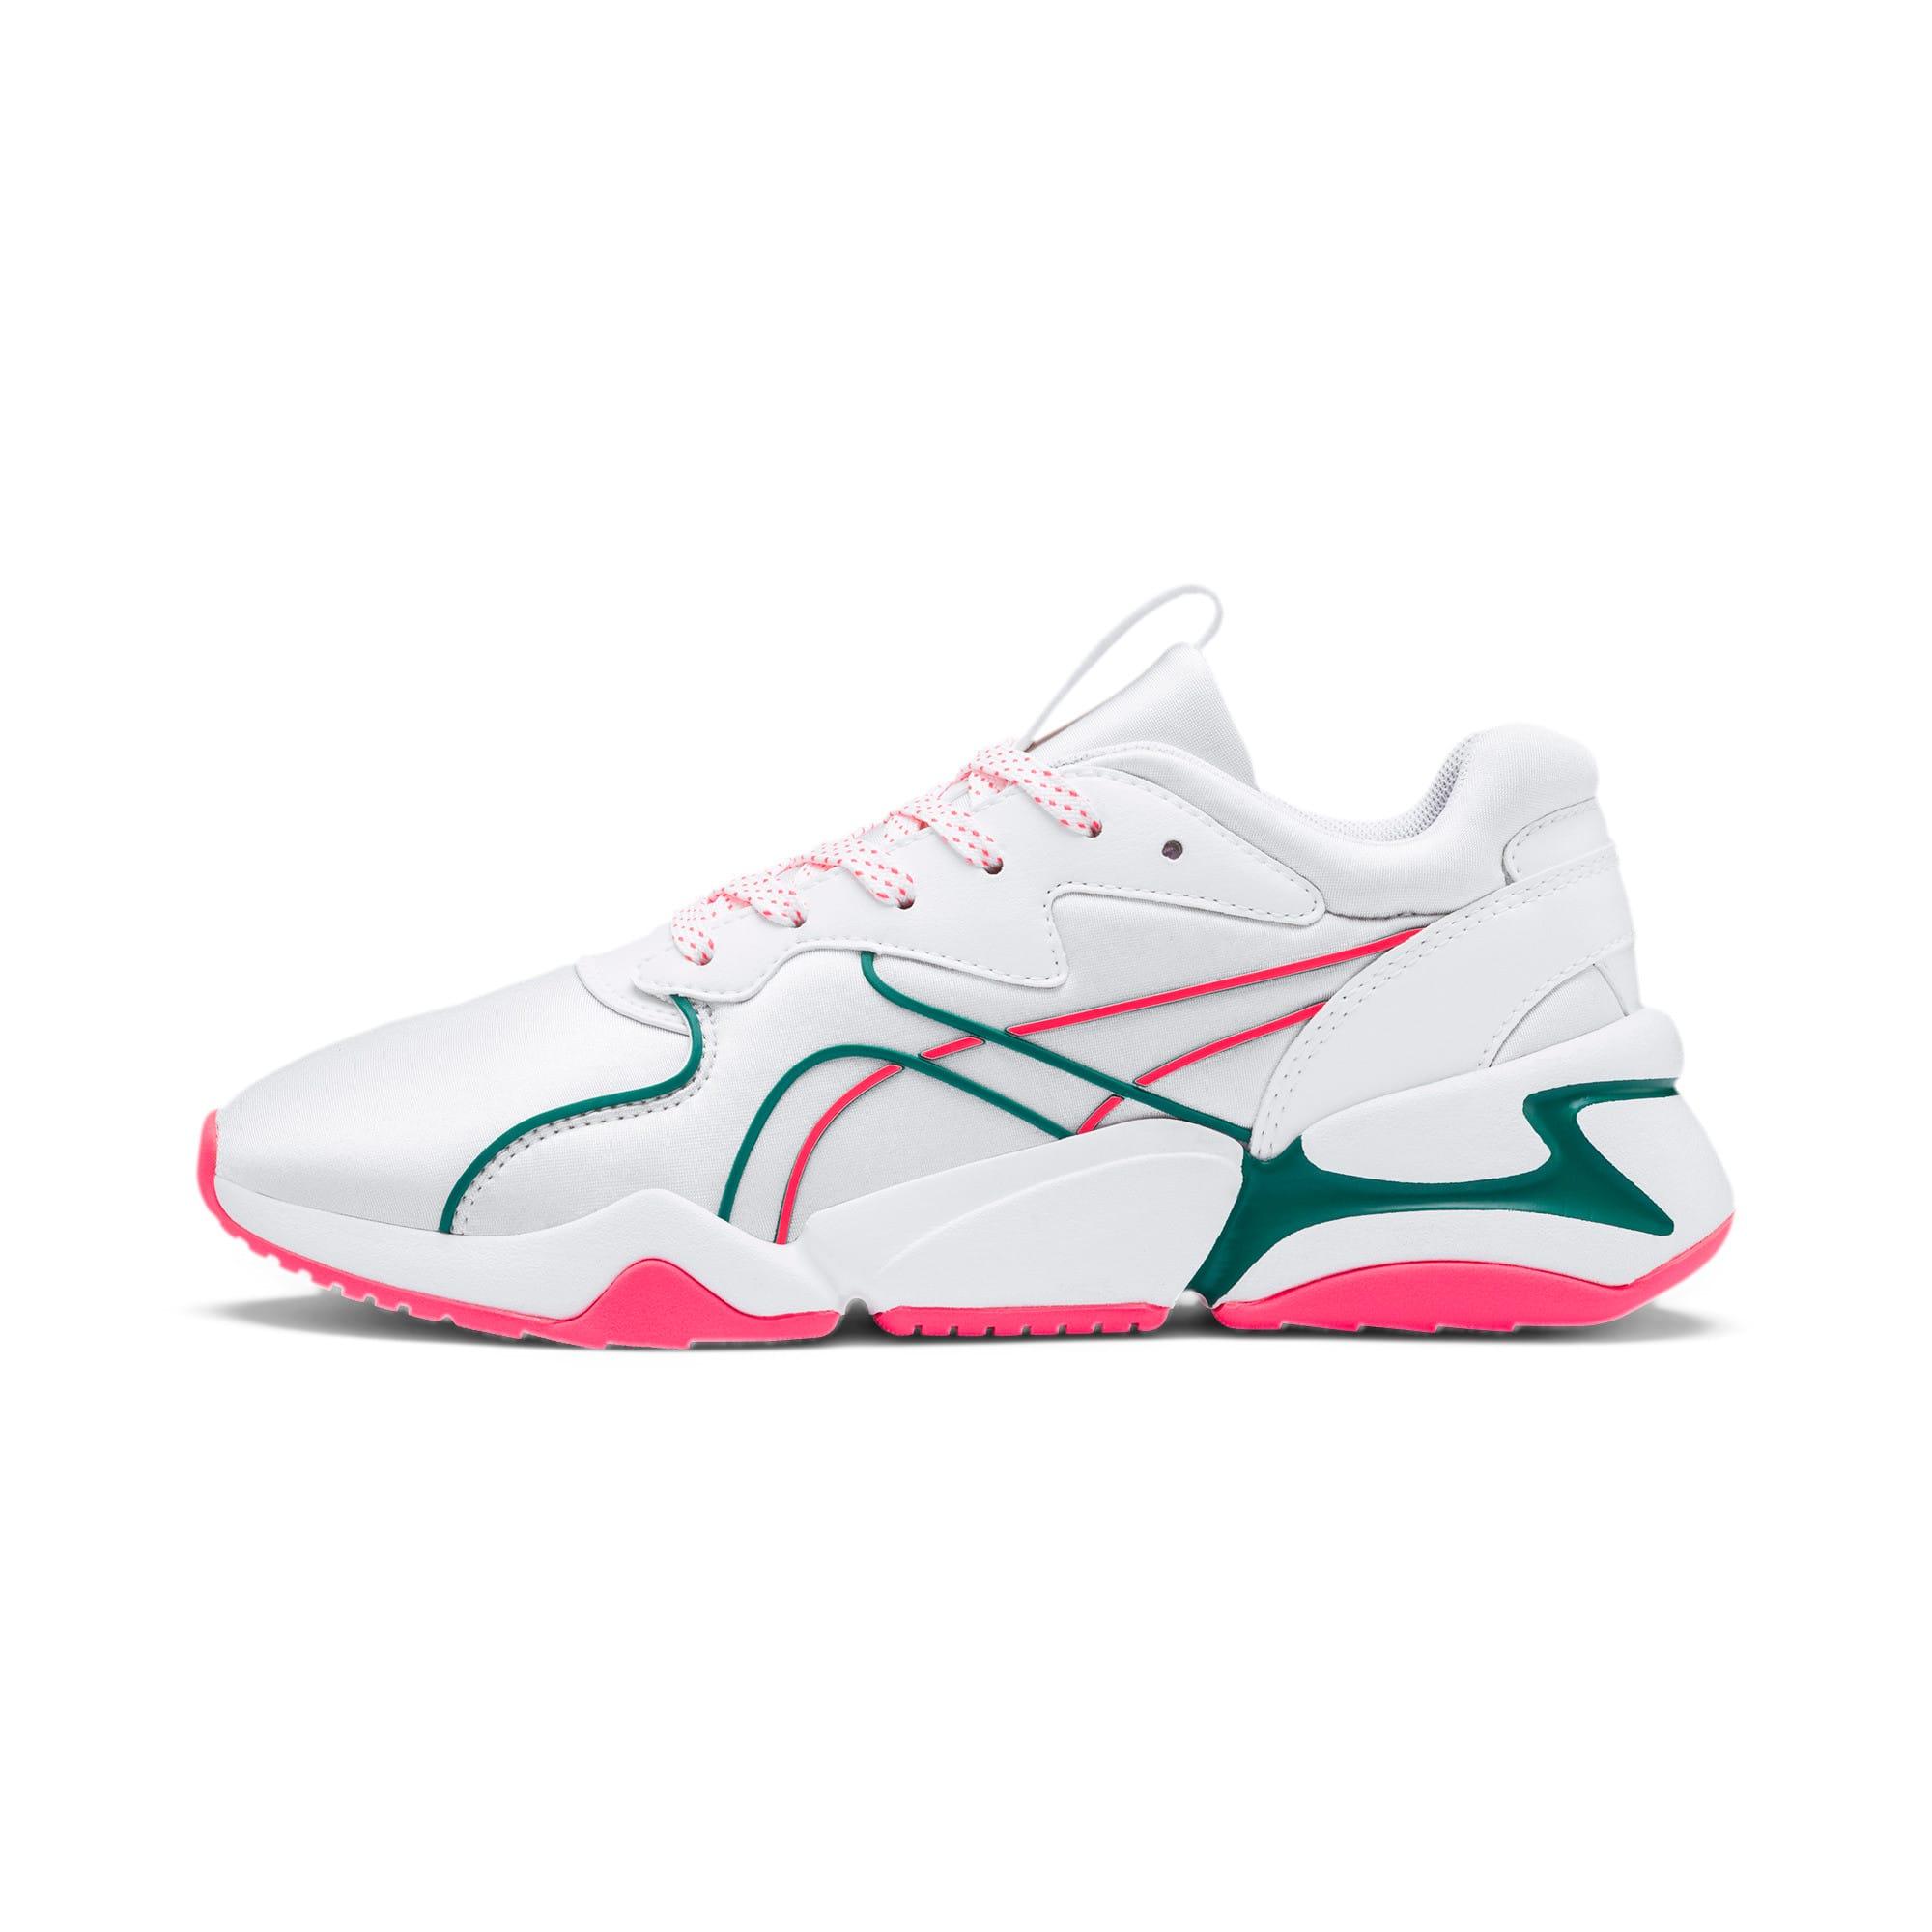 Thumbnail 1 of Nova Hypertech Women's Sneakers, Puma White, medium